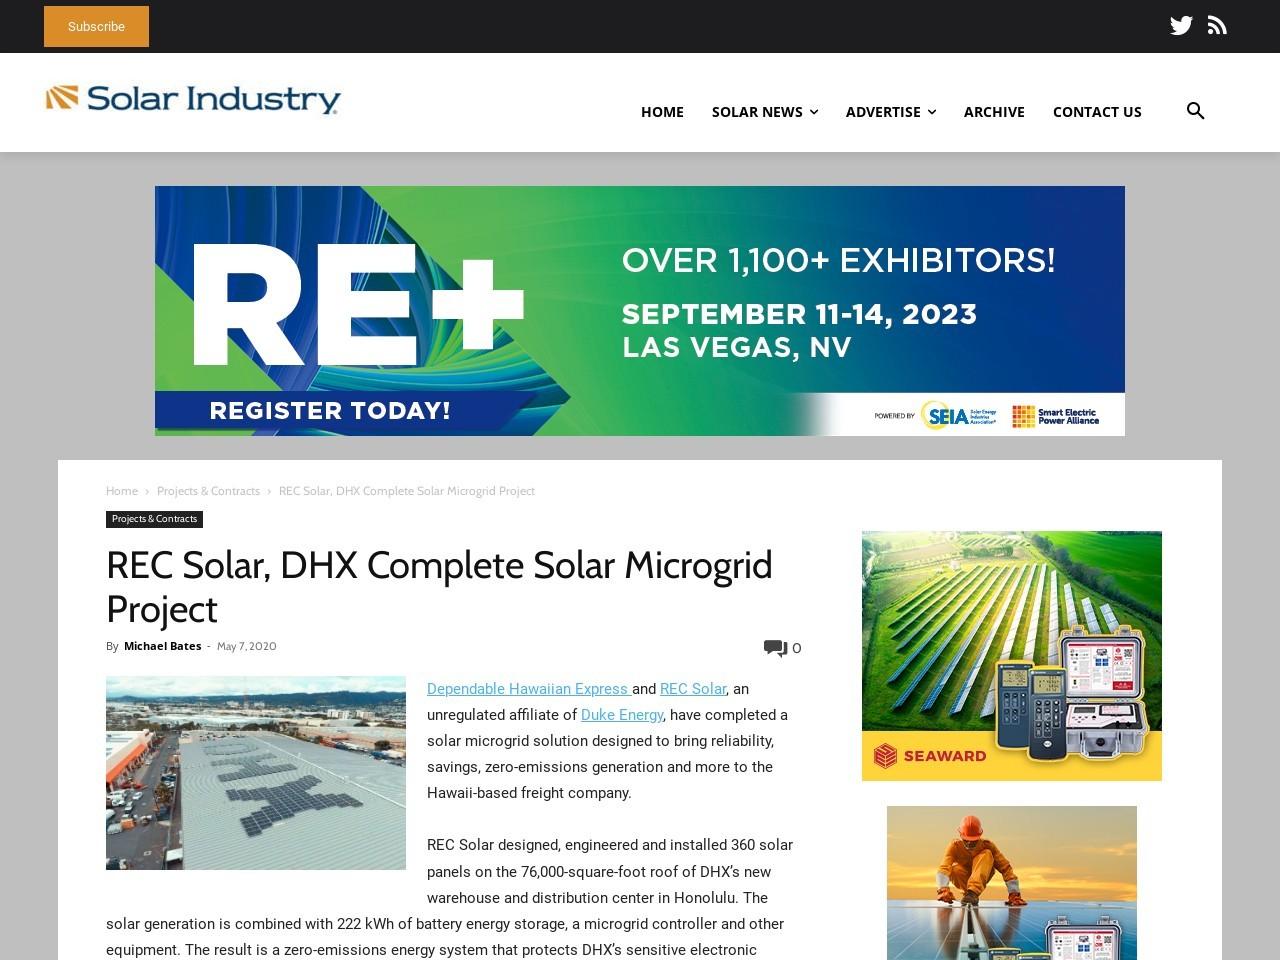 REC Solar, DHX Complete Solar Microgrid Project